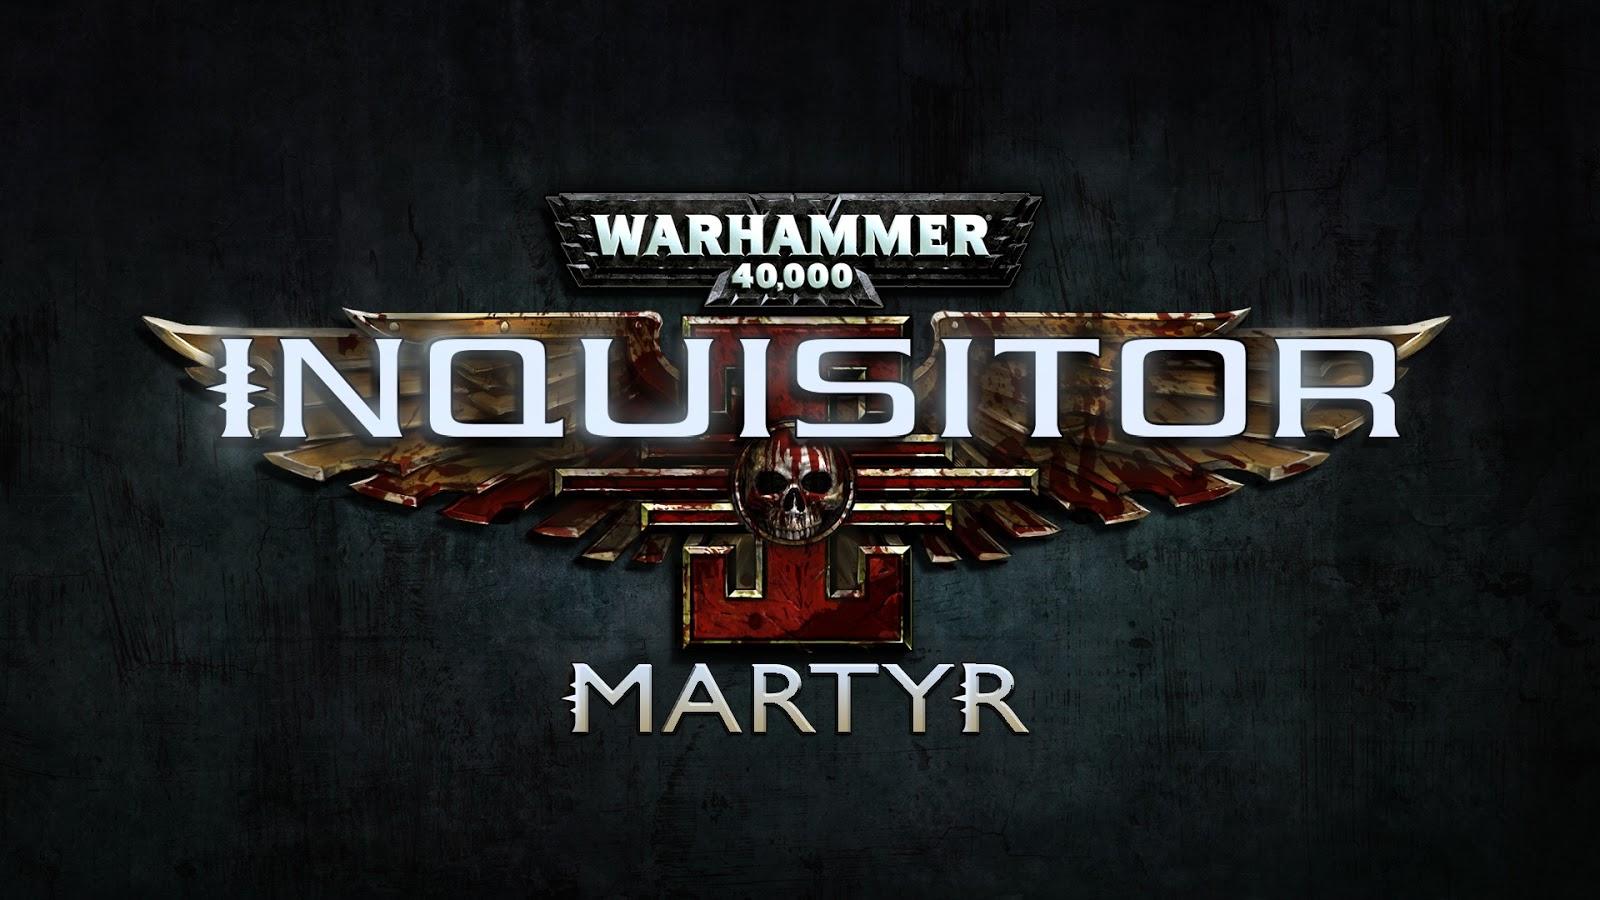 Warhammer 40 000 Inquisitor Martyr Xbox360 - Warhammer 40 000 Inquisitor Martyr For Xbox360